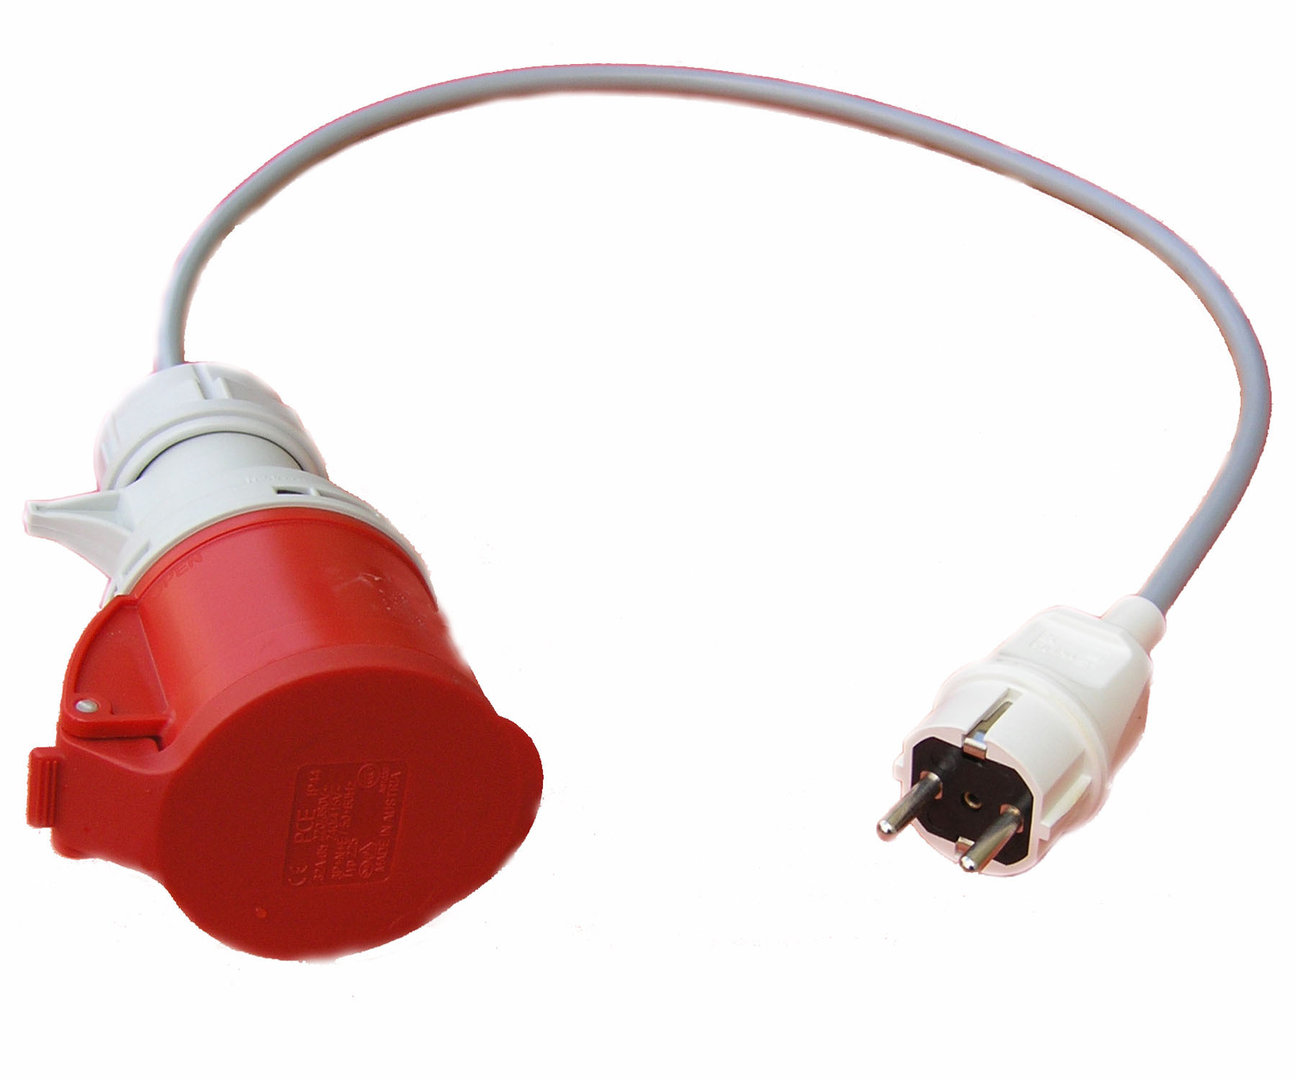 stecker adapter schuko cee 16a car go electric. Black Bedroom Furniture Sets. Home Design Ideas